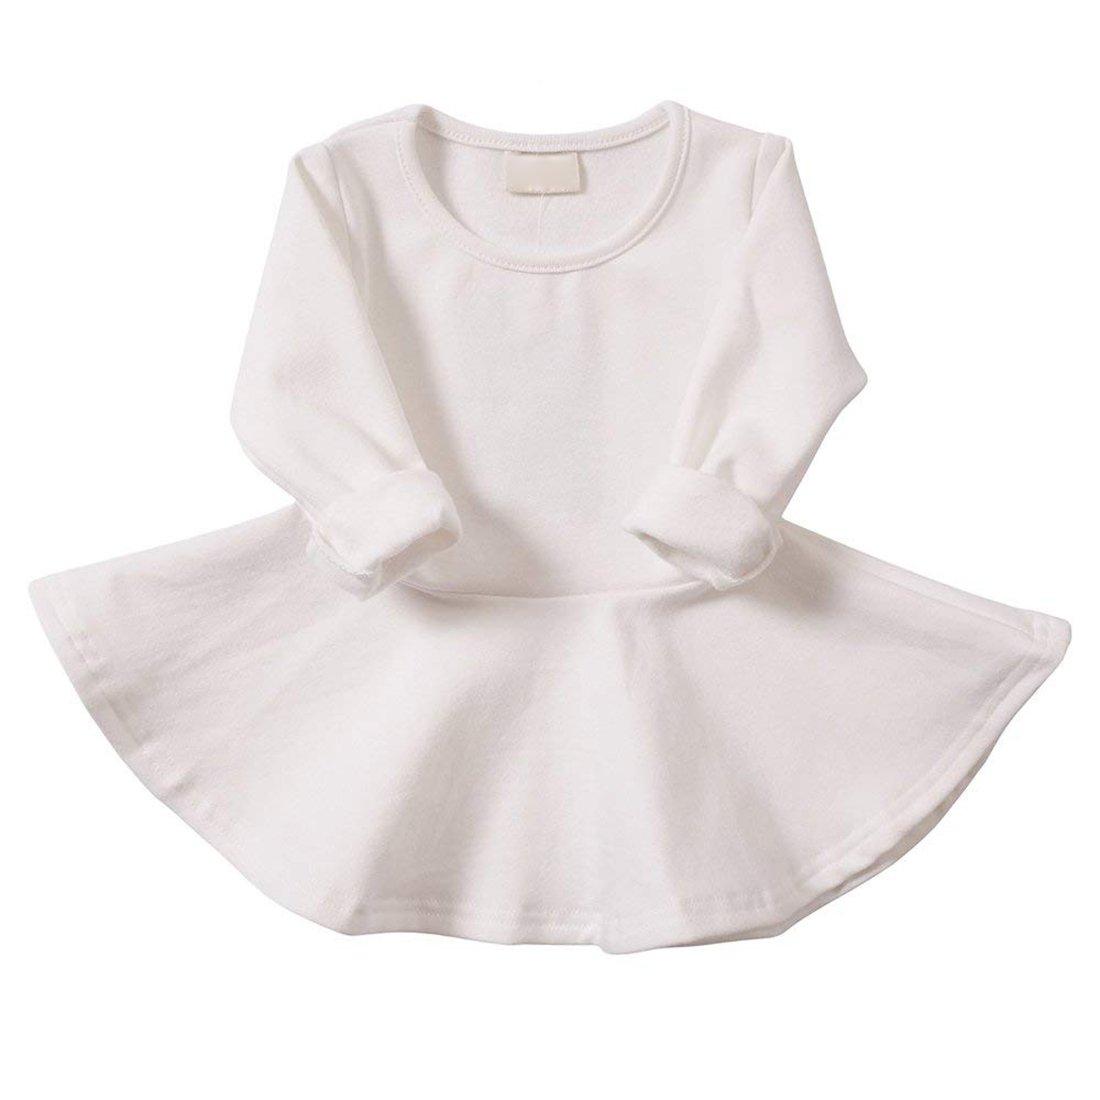 lymanchi Baby Girl Dresses Short Sleeve Toddler Girl Ruffle Infant Cotton Cute Dress White 2T/3T